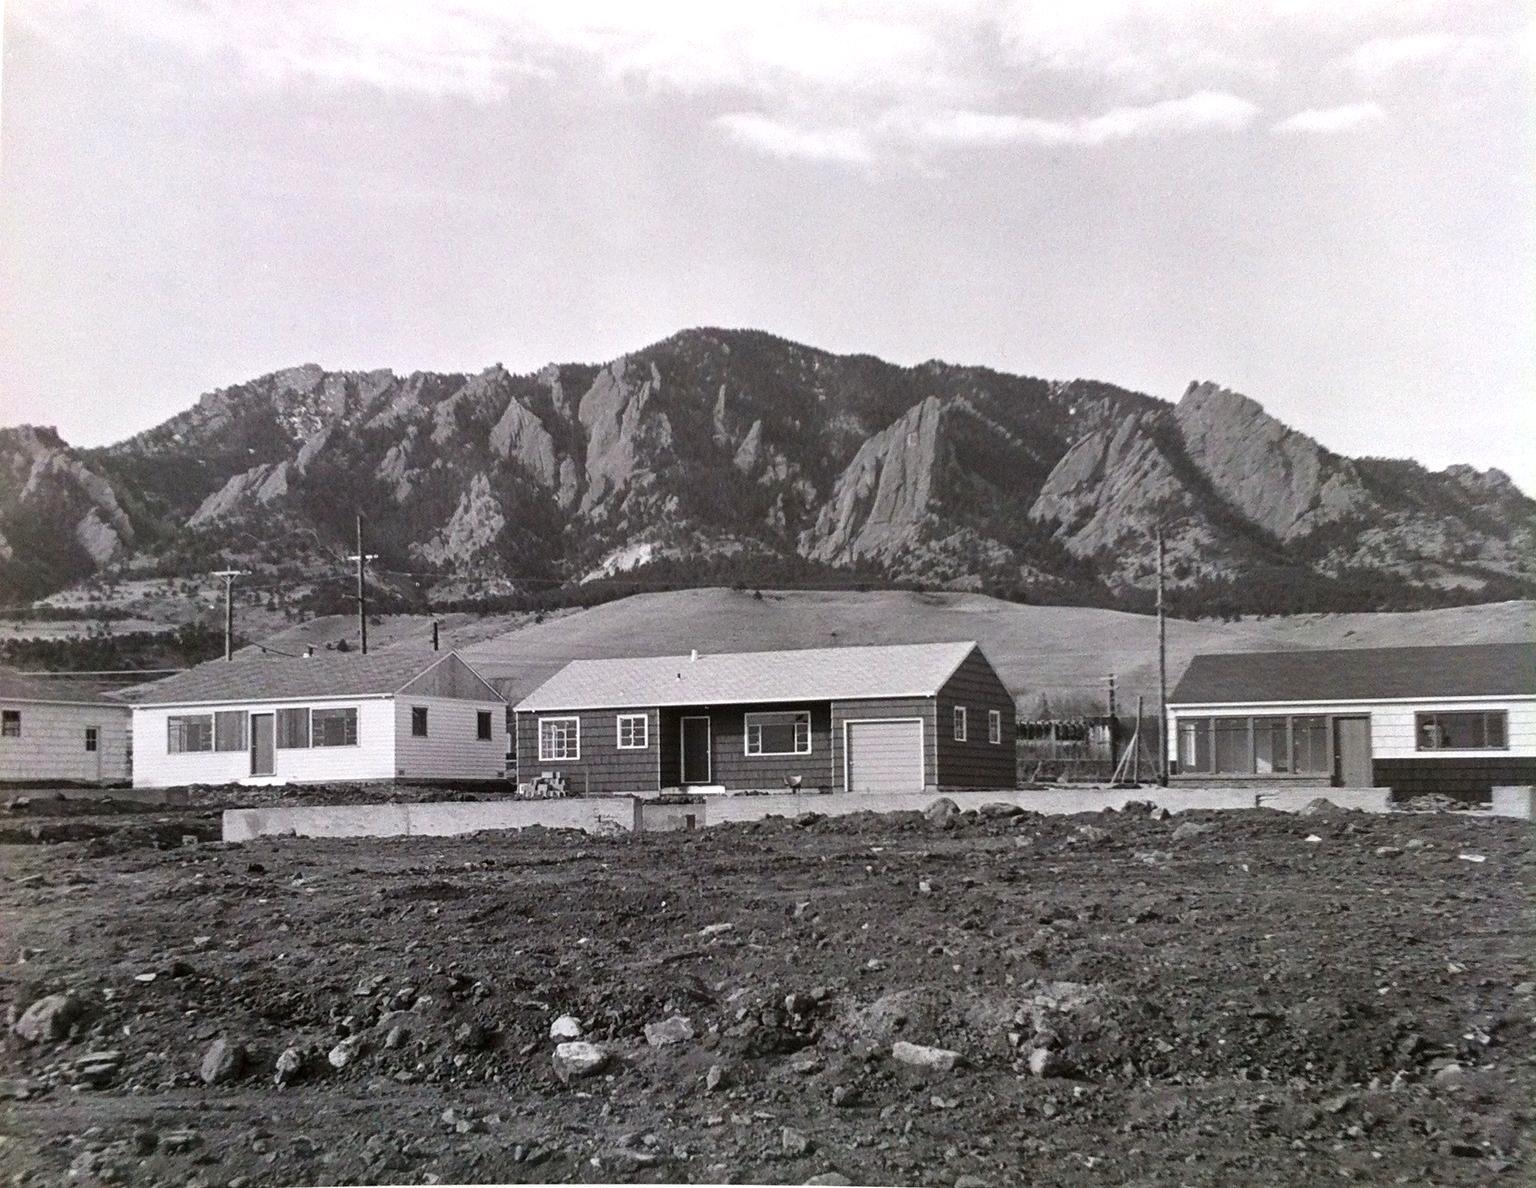 Homes in the Martin Acres Neighborhood in Boulder, CO,Circa 1950s